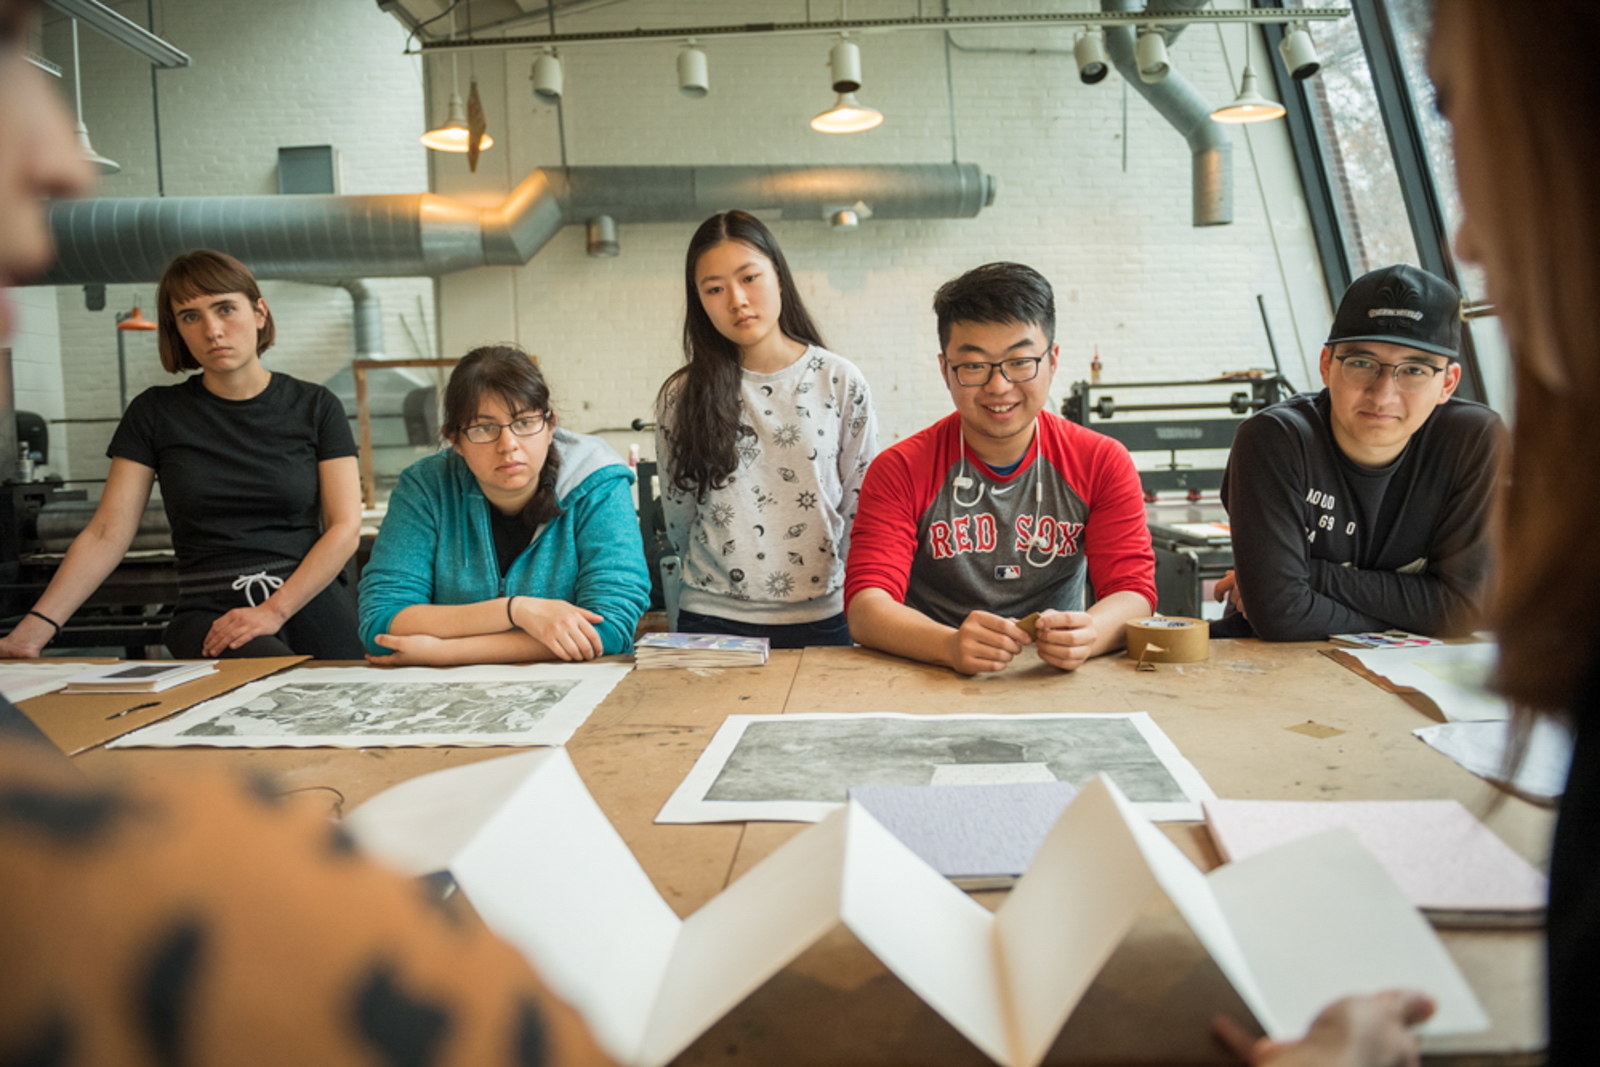 Group of students in art studio seen over the instructor's shoulder